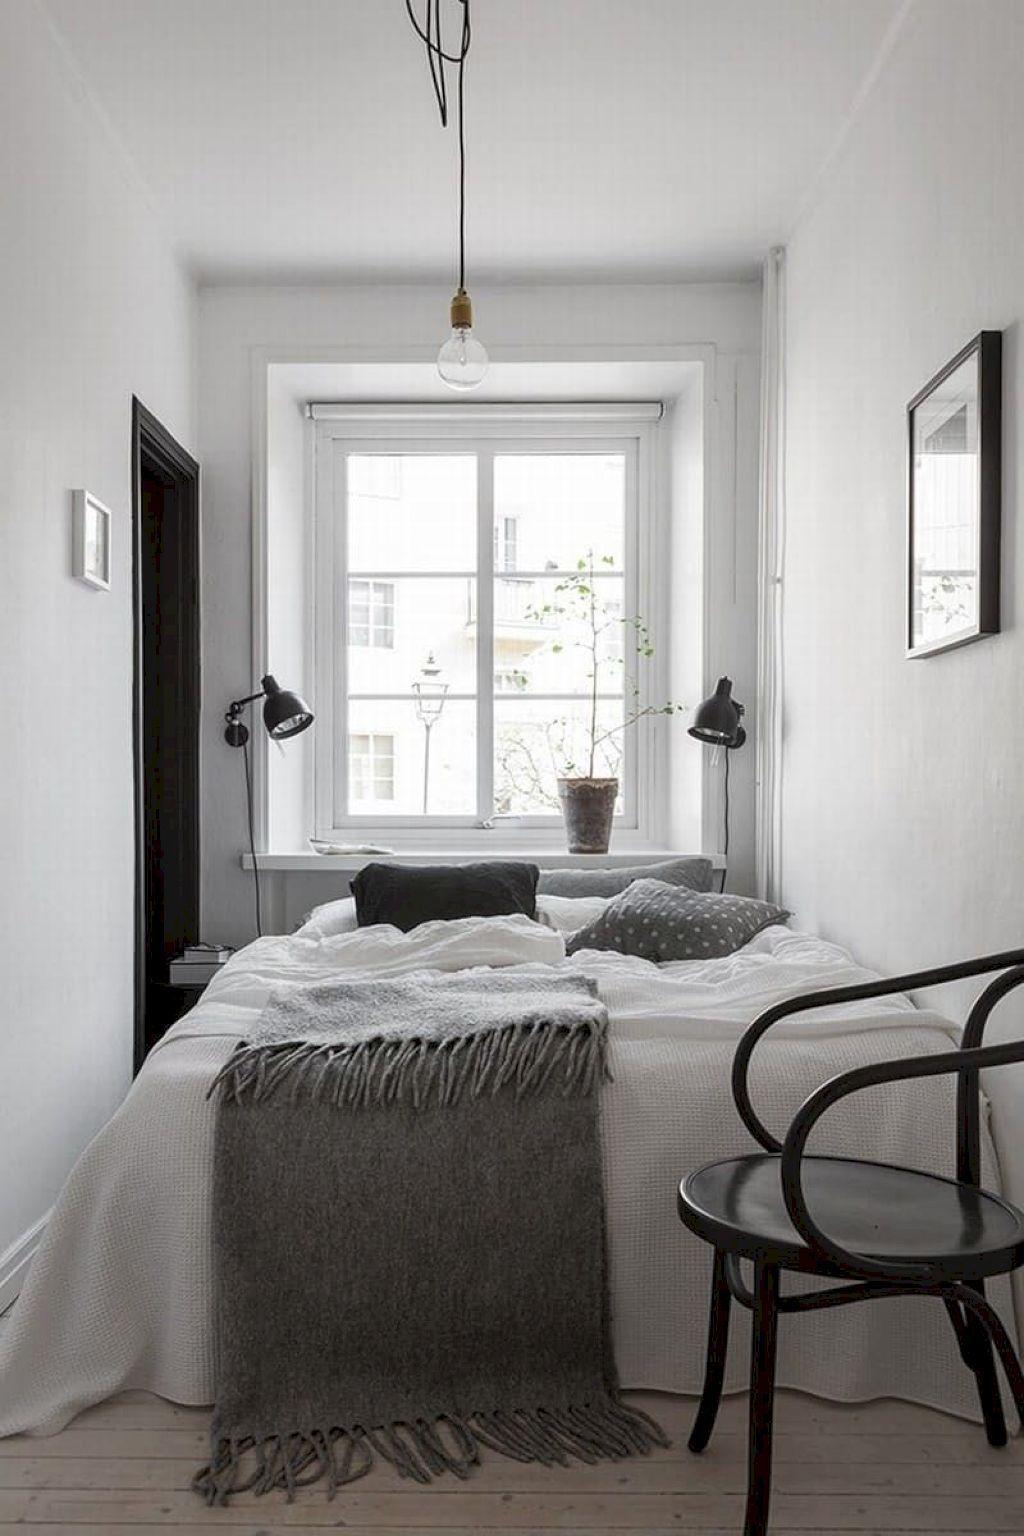 Nice cozy tiny bedroom remodel ideas https homeideas also design rh pinterest